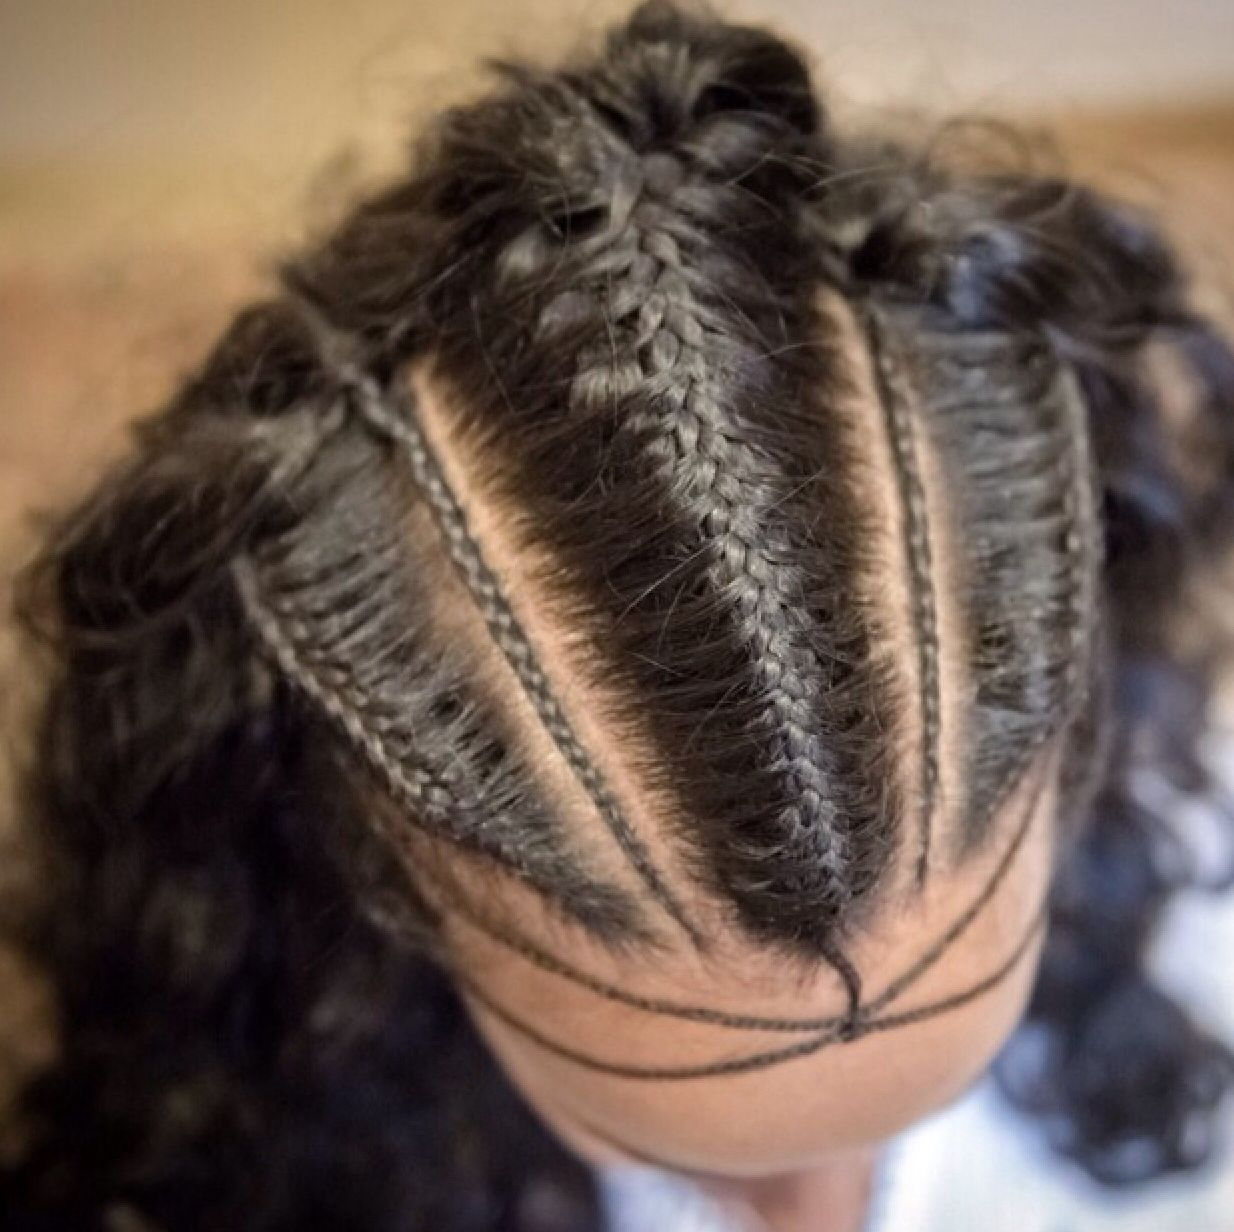 ethiopian hair style | hair | pinterest | ethiopian hair style